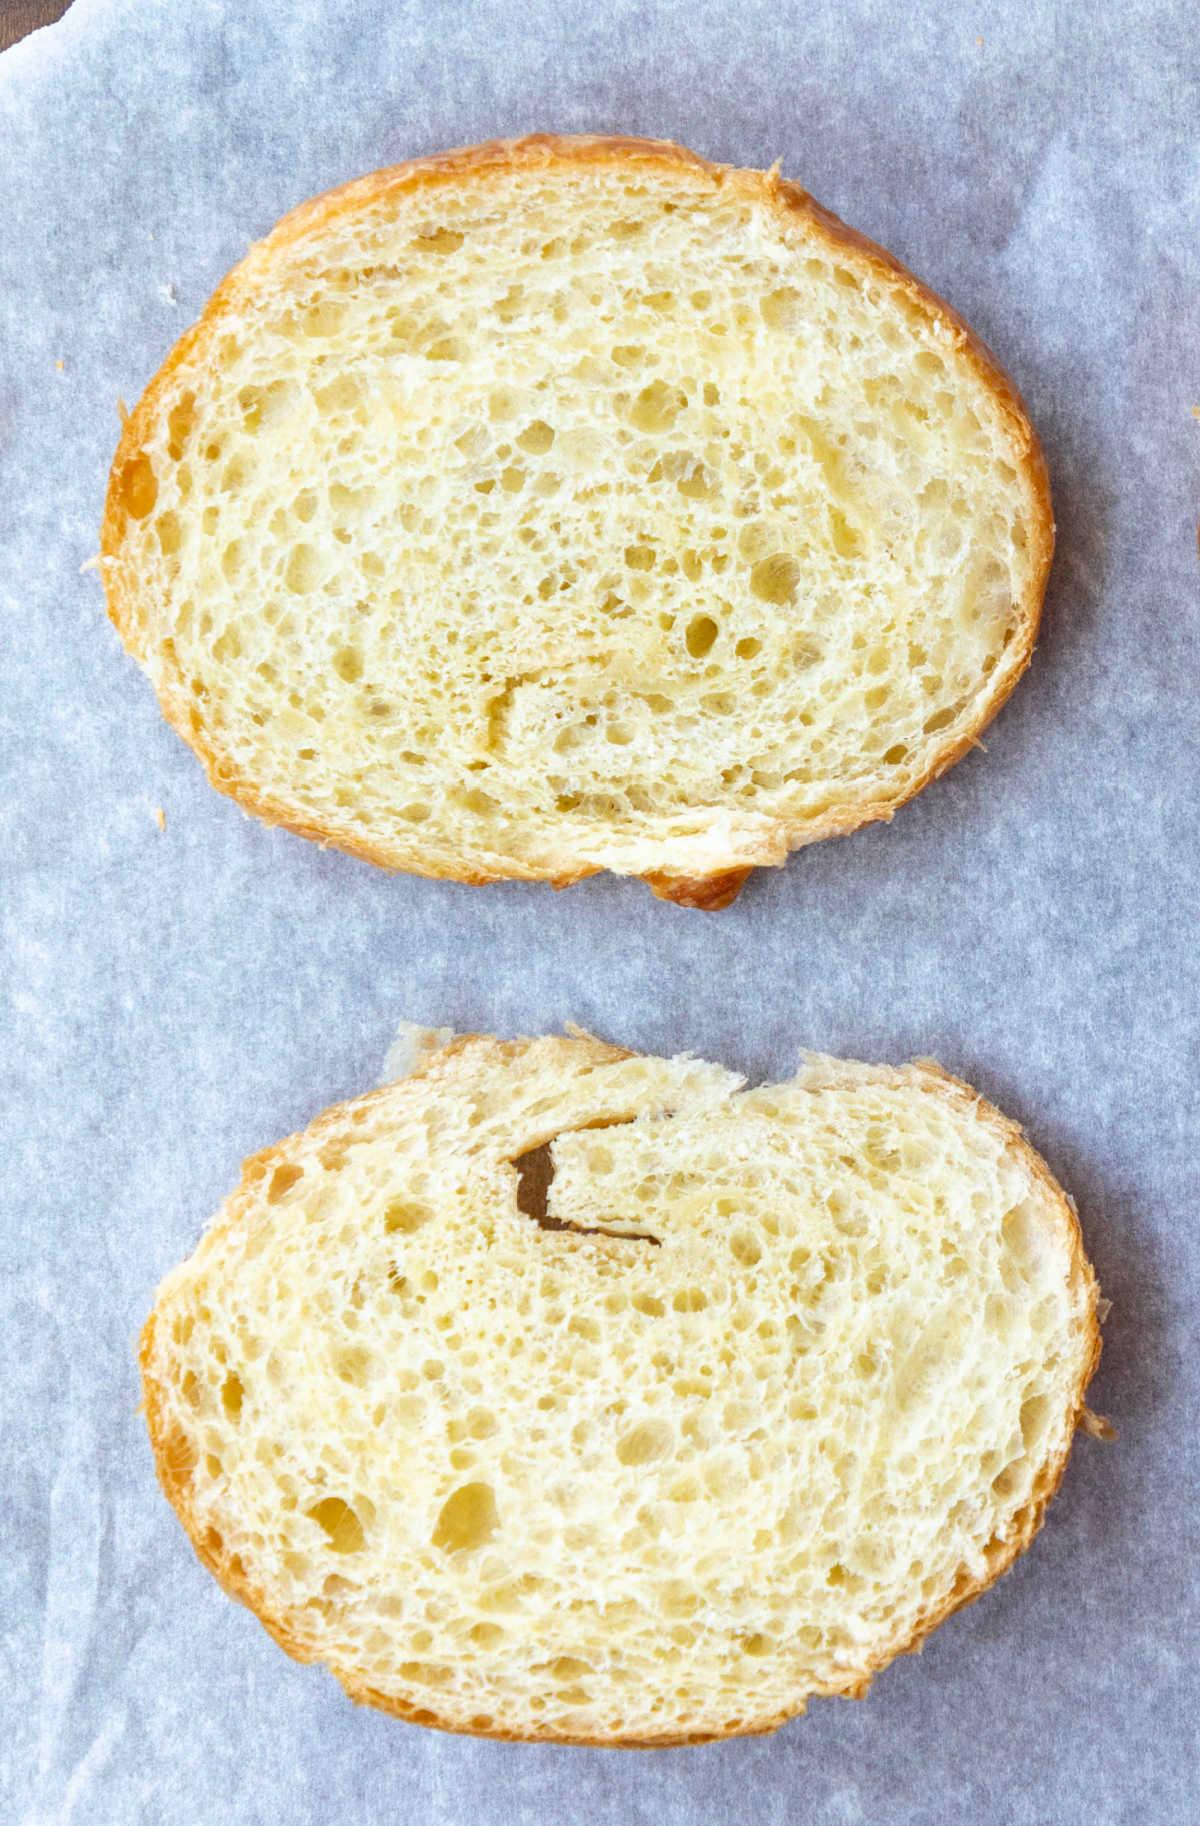 croissant sliced in half.